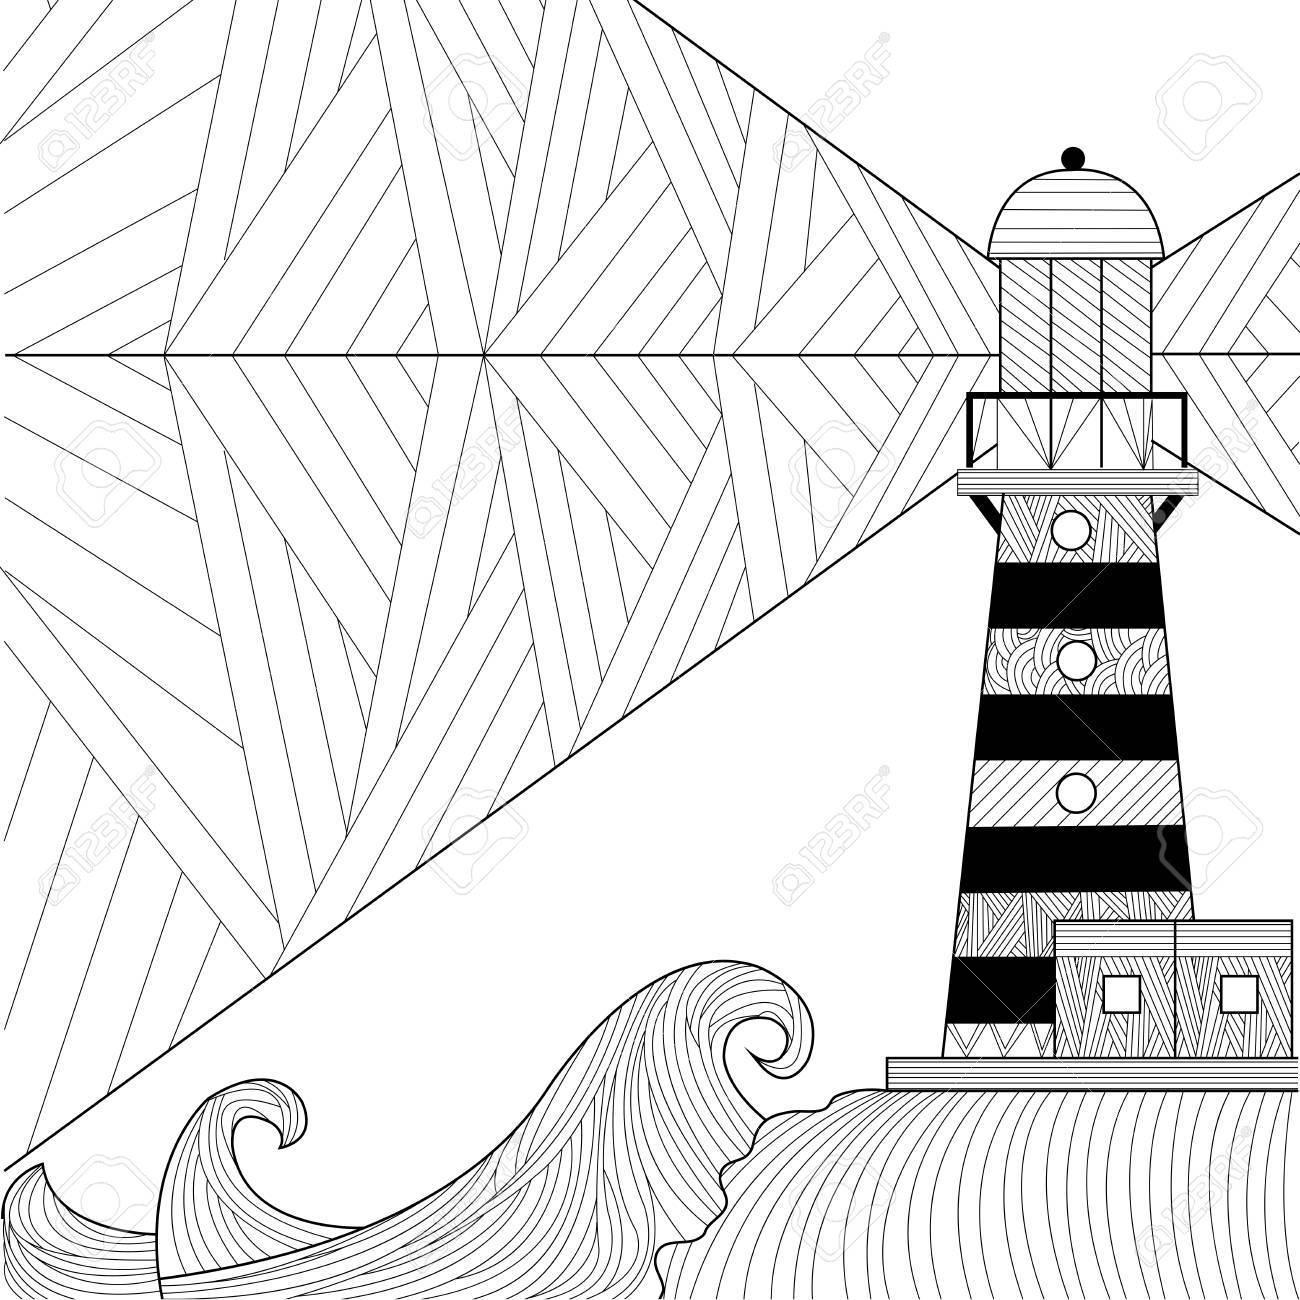 Diseno De Arte De La Linea De Paisaje Marino Para Colorear Libro